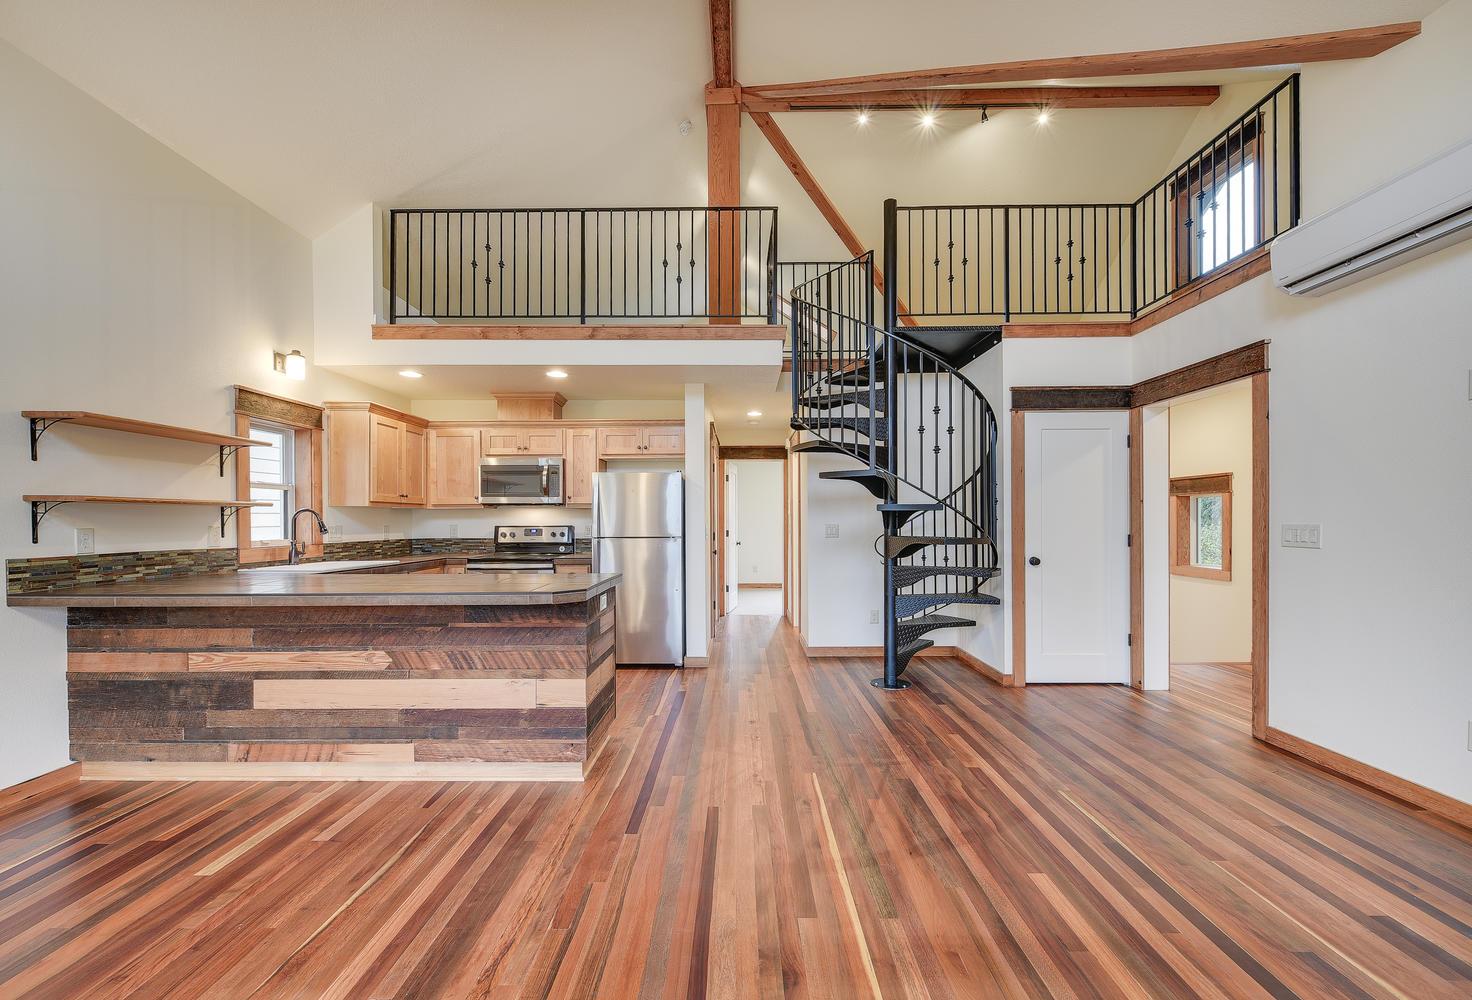 Harka Architecture_Sunnyside Home ADU (8).jpg